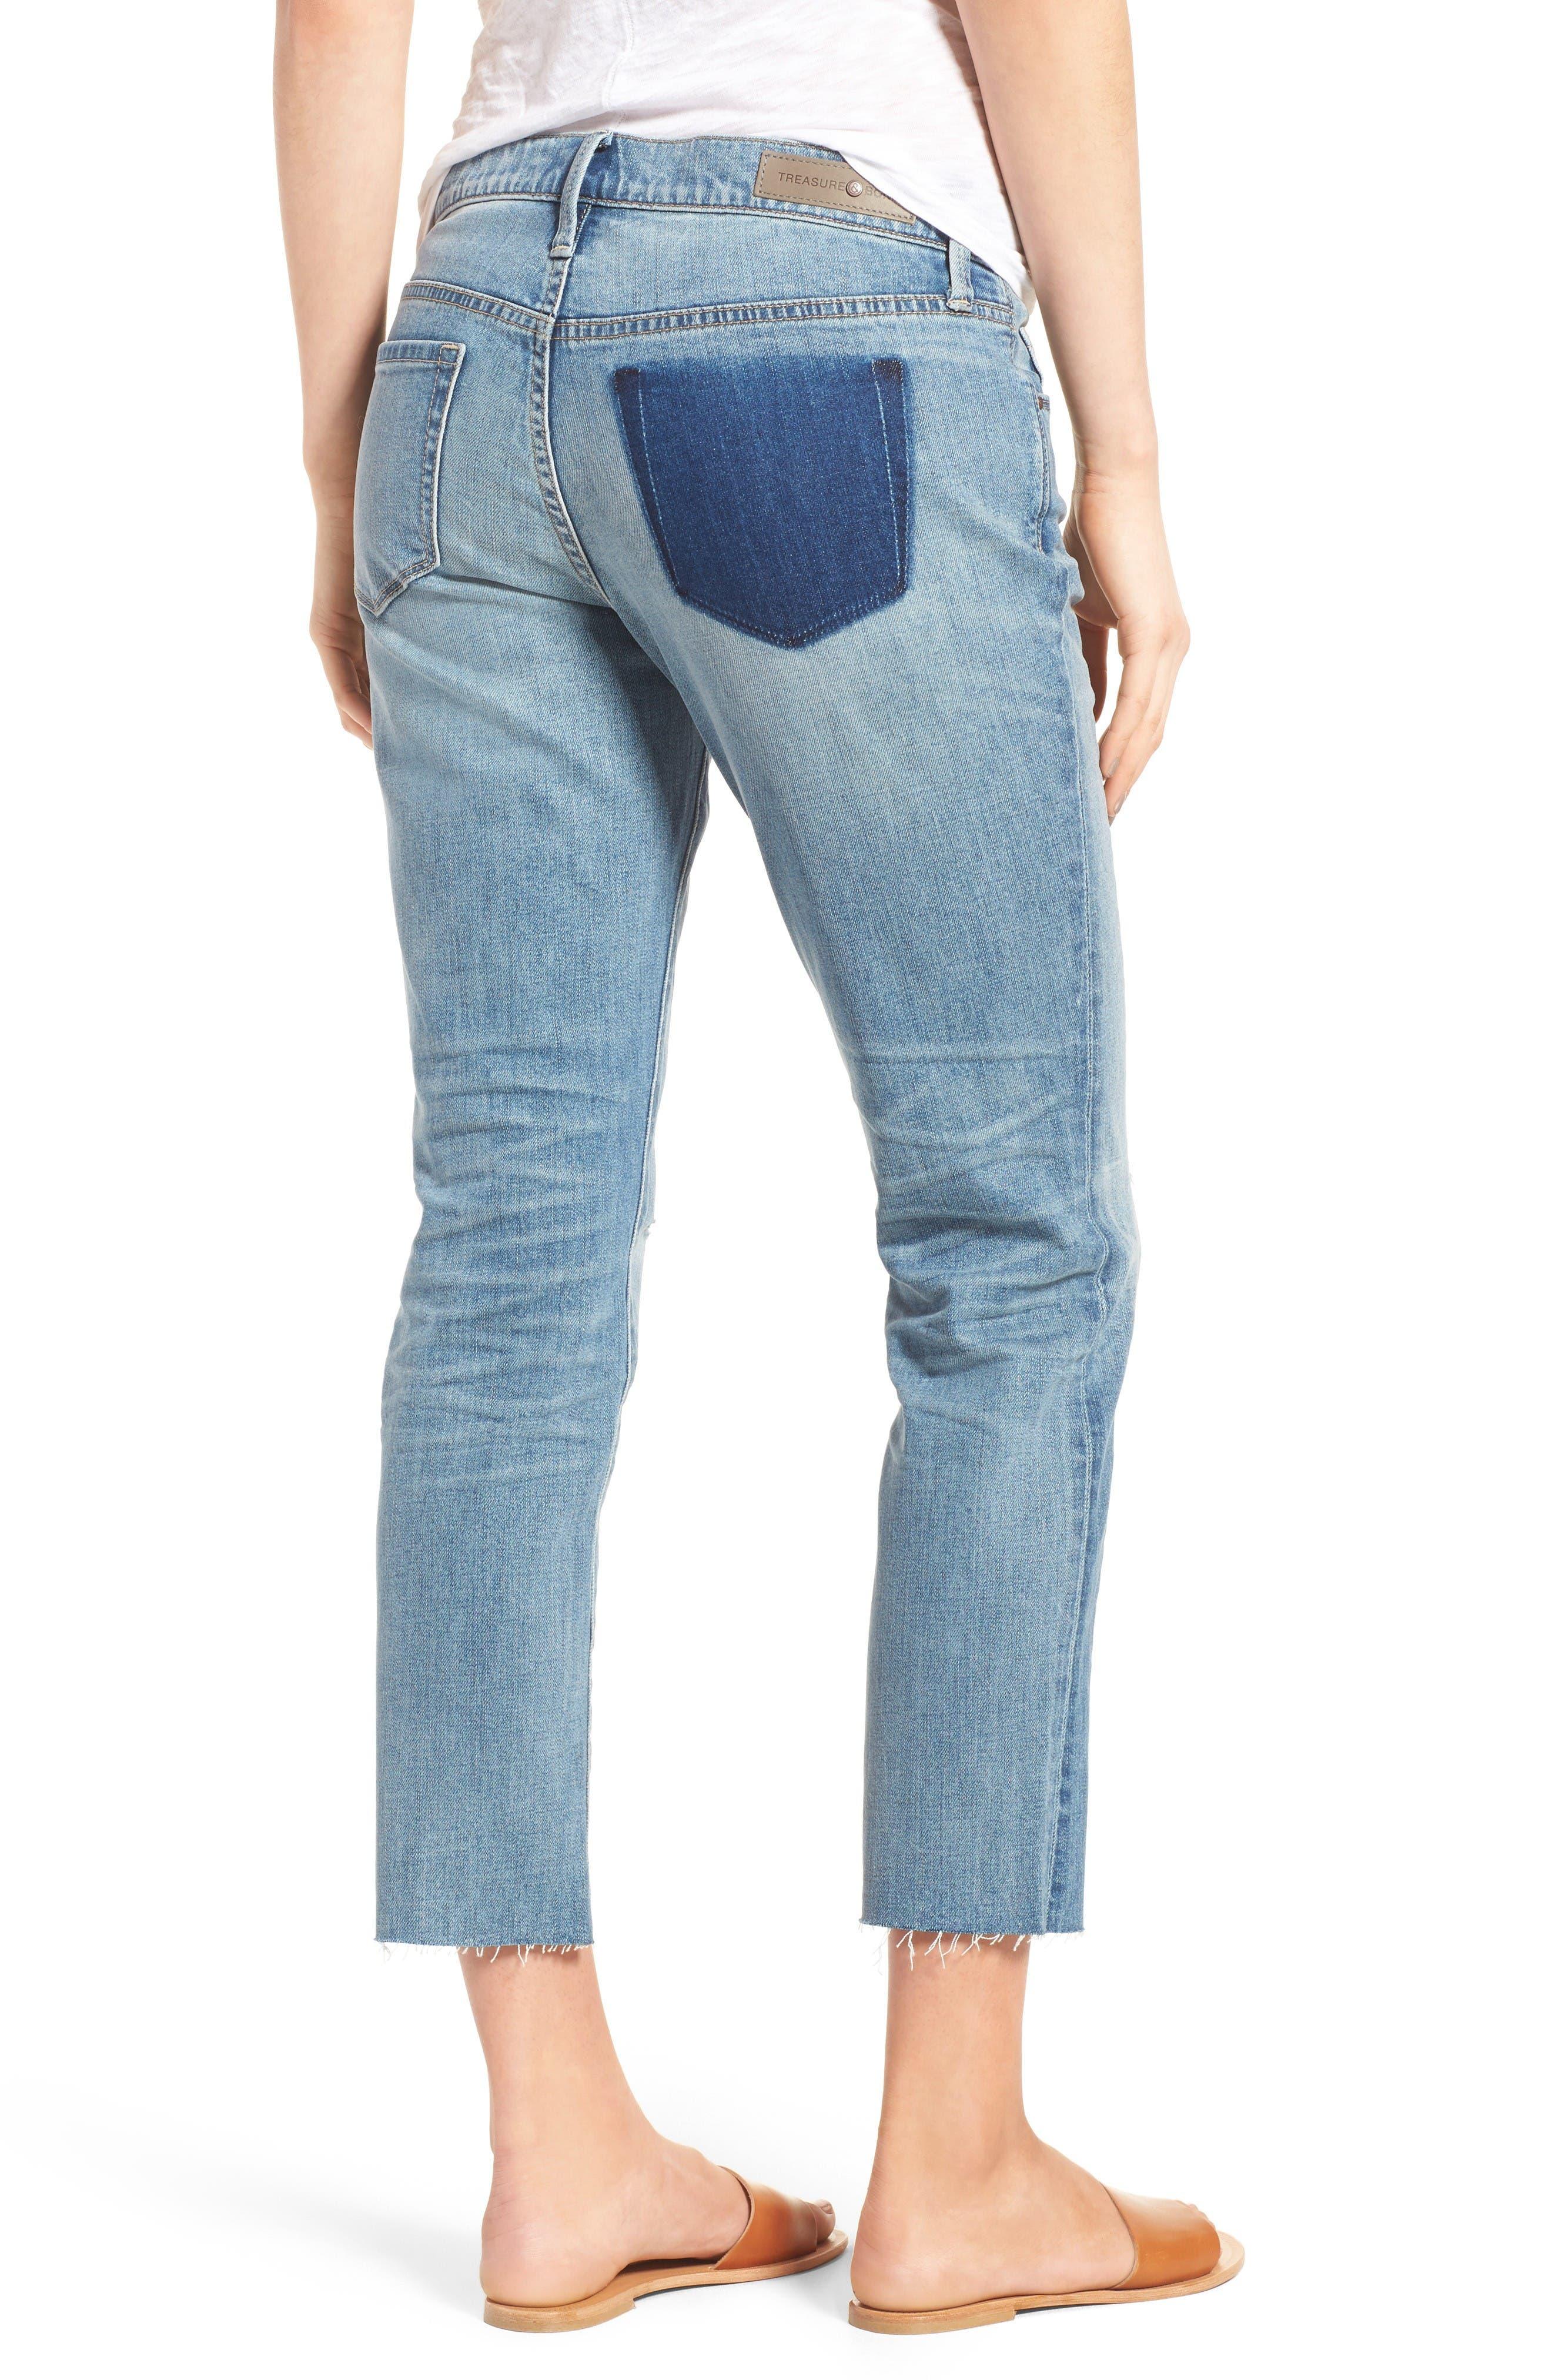 Alternate Image 3  - Treasure & Bond Skinny Boyfriend Jeans (Gravel Medium Remade)